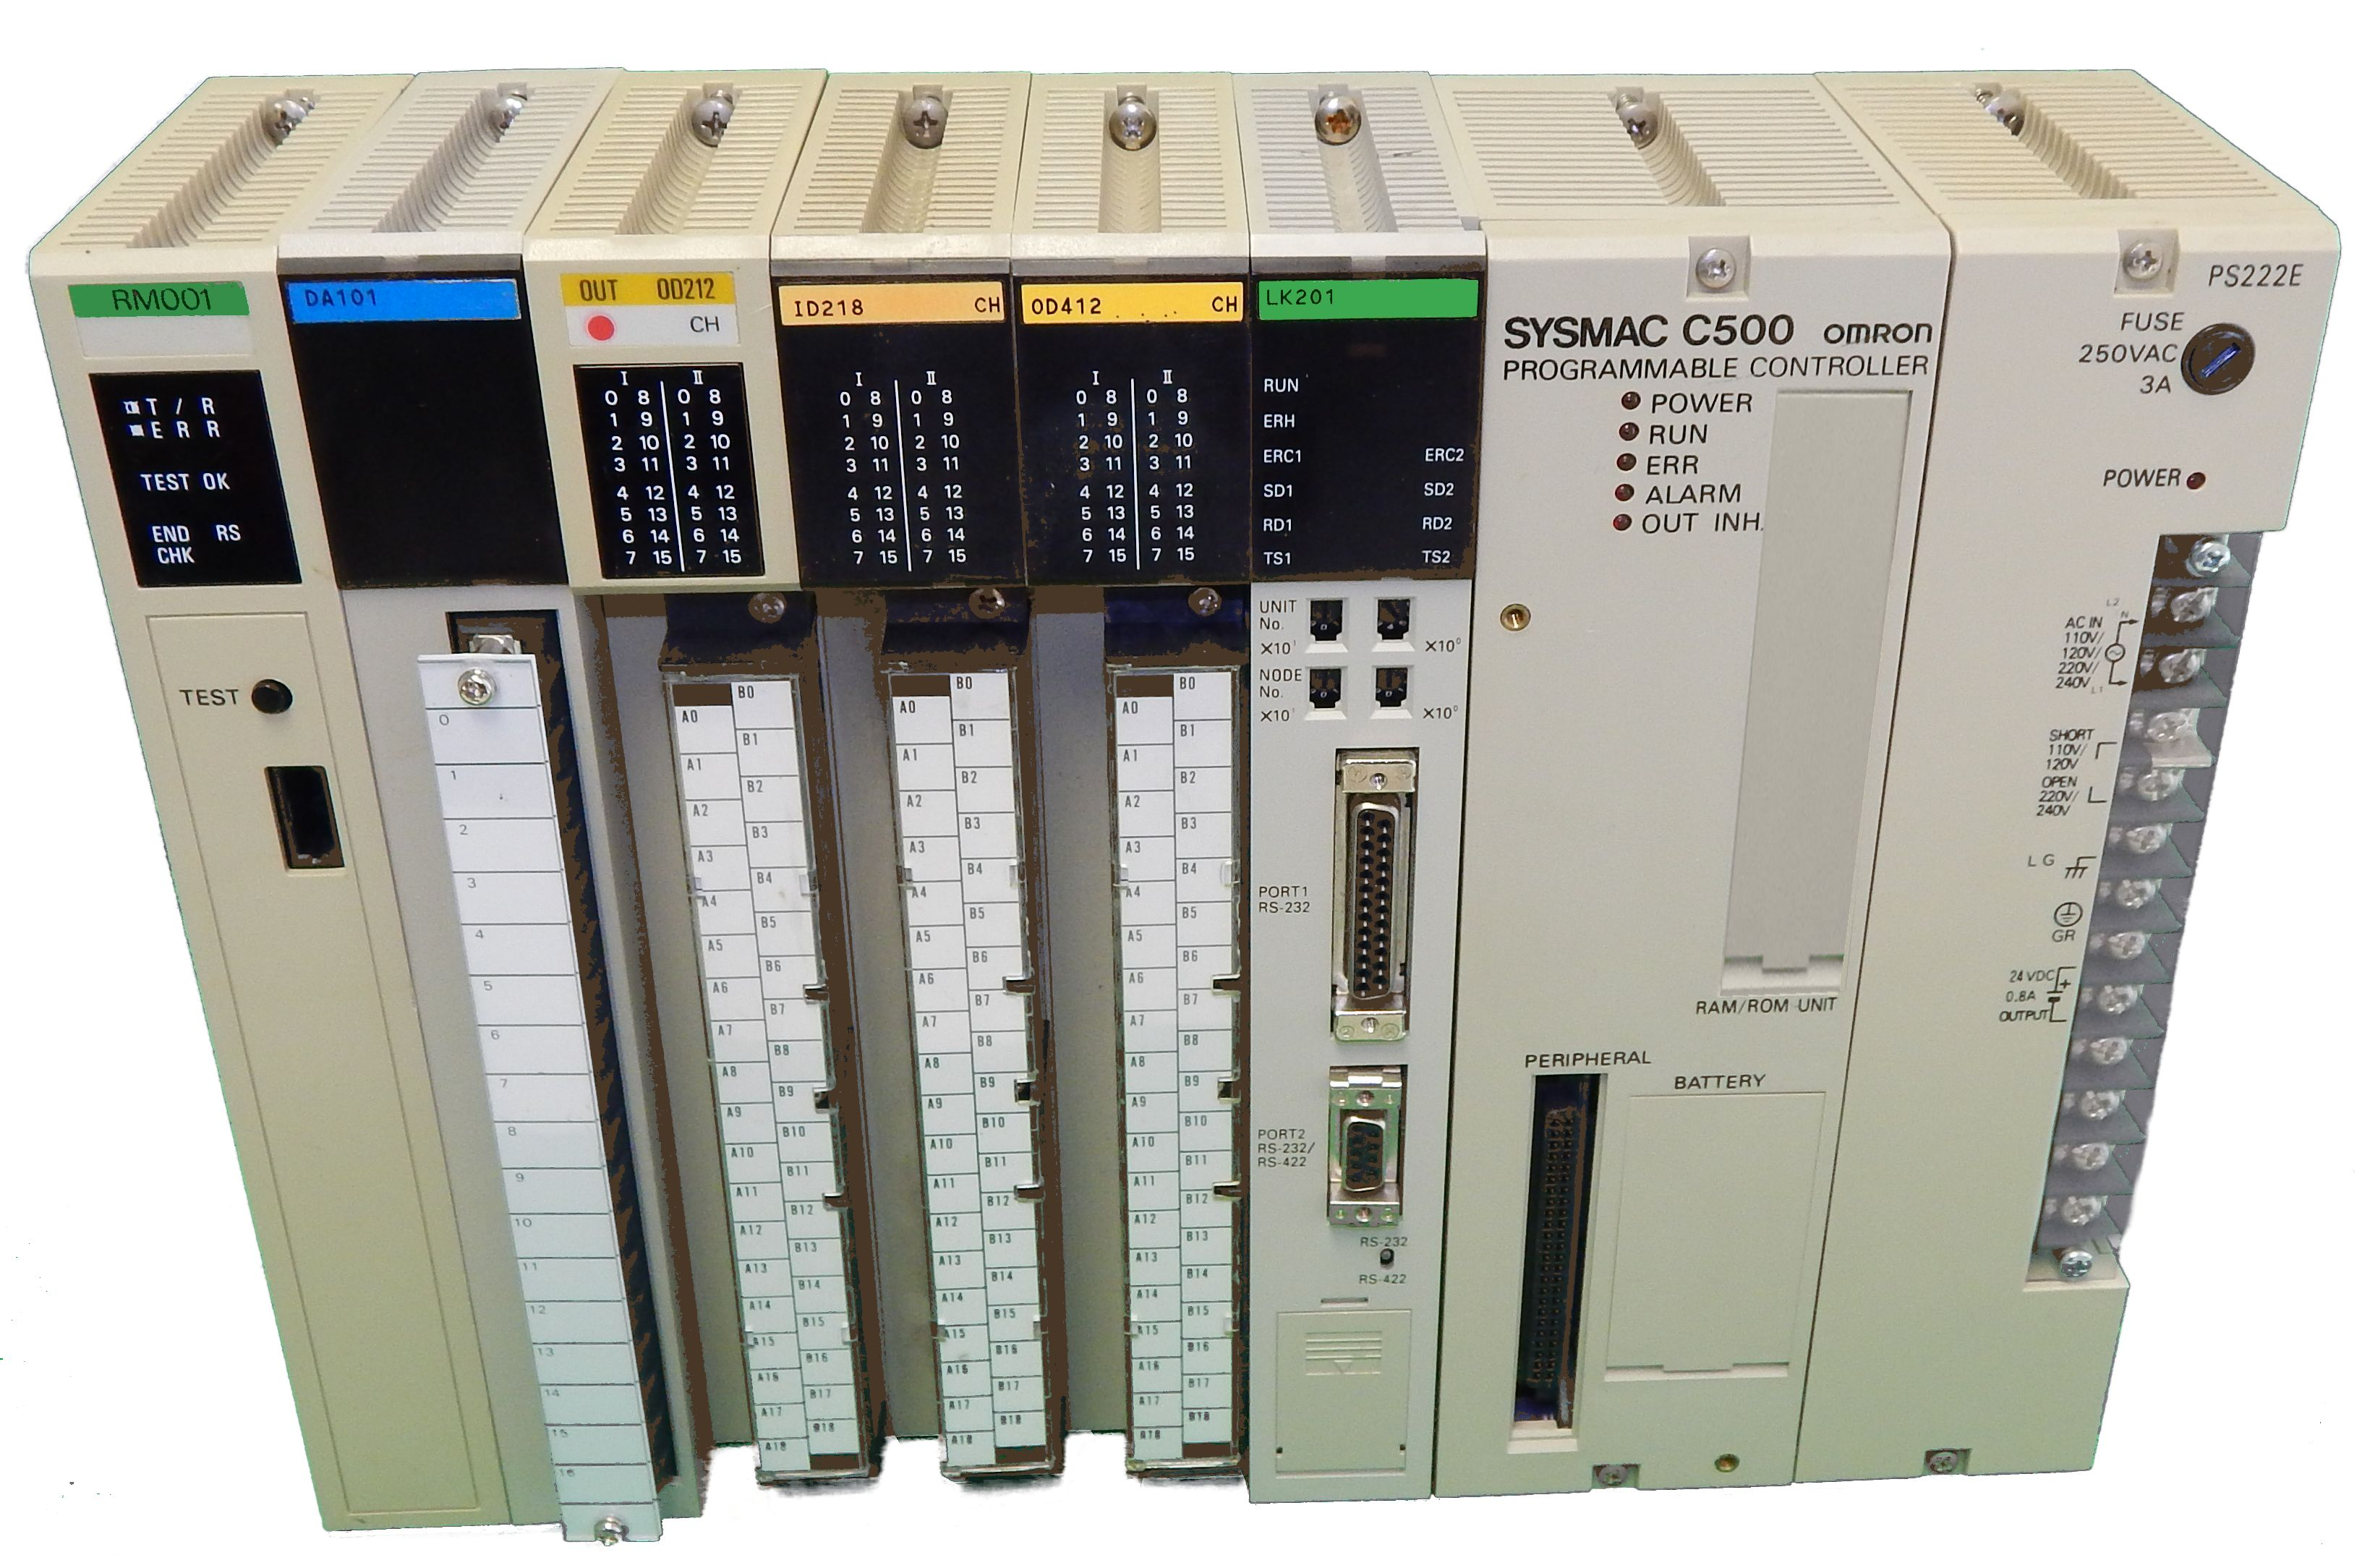 3G2C7-LK202-EV1